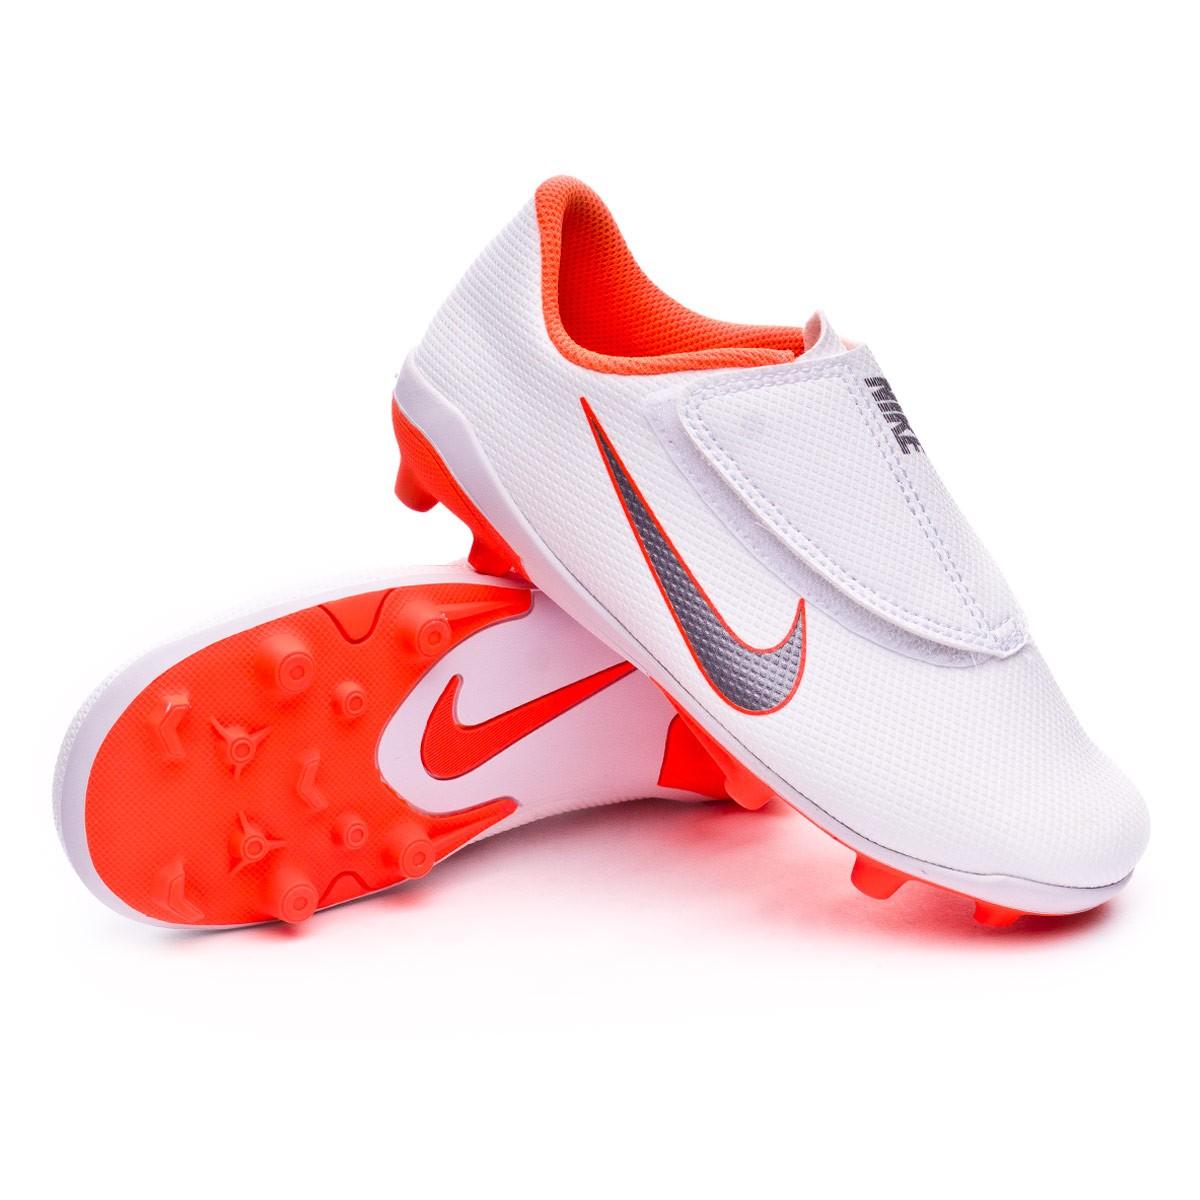 new style 079d7 848f0 Zapatos de fútbol Nike Mercurial Vapor XII Club PS Velcro MG Niño  White-Metallic cool grey-Total orange - Tienda de fútbol Fútbol Emotion